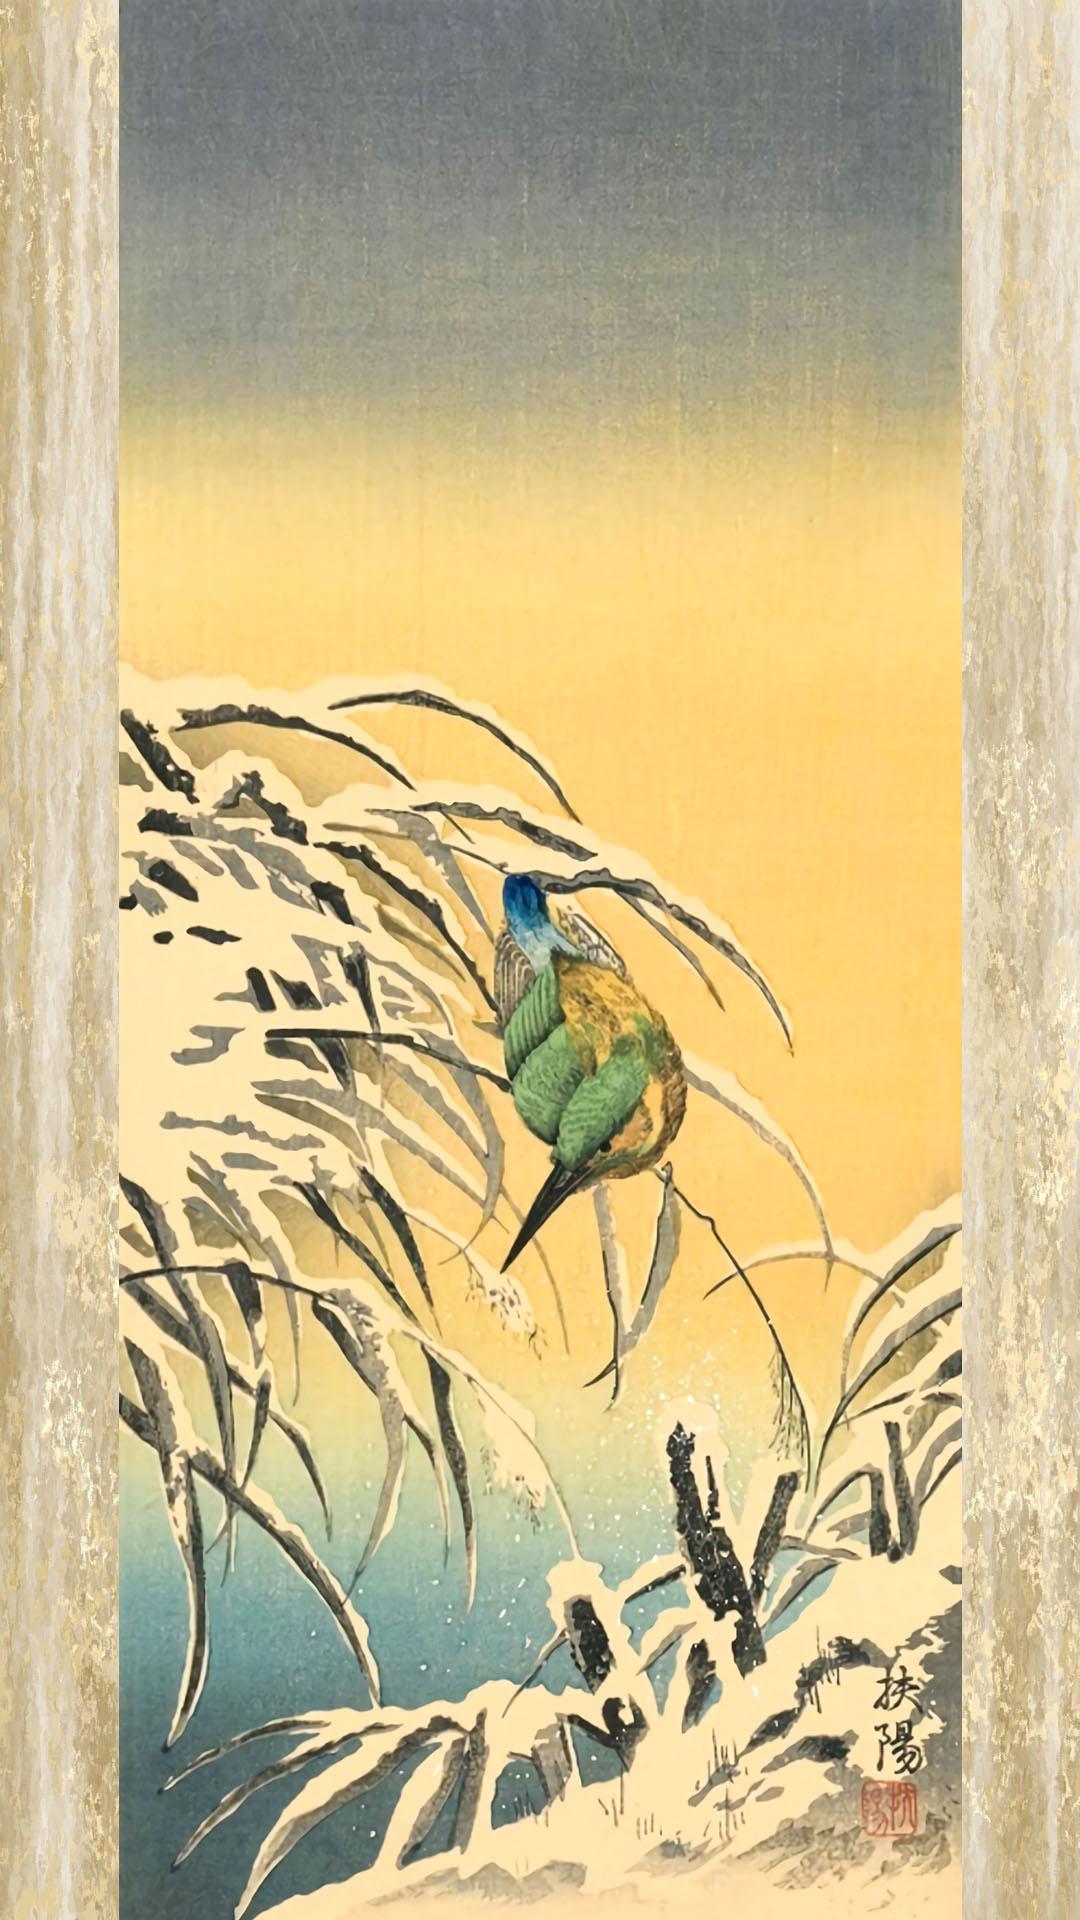 Narasaki Fuyou - Secchu kawasemi 1080x1920 2